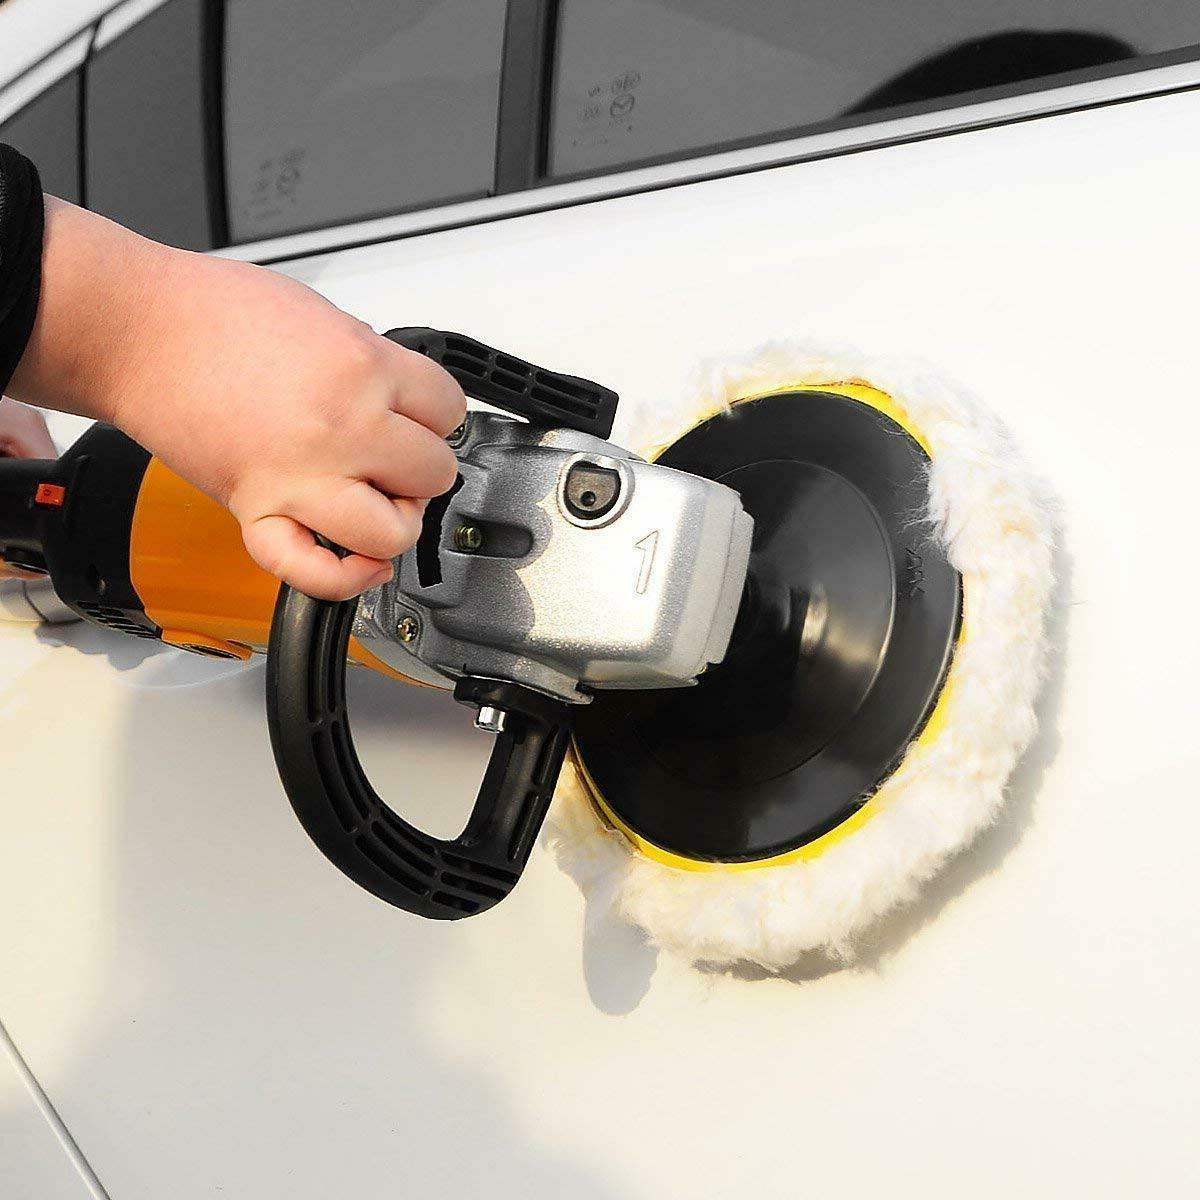 Electric Car Polisher 6-Speed Buffer Sander w/Bonnet